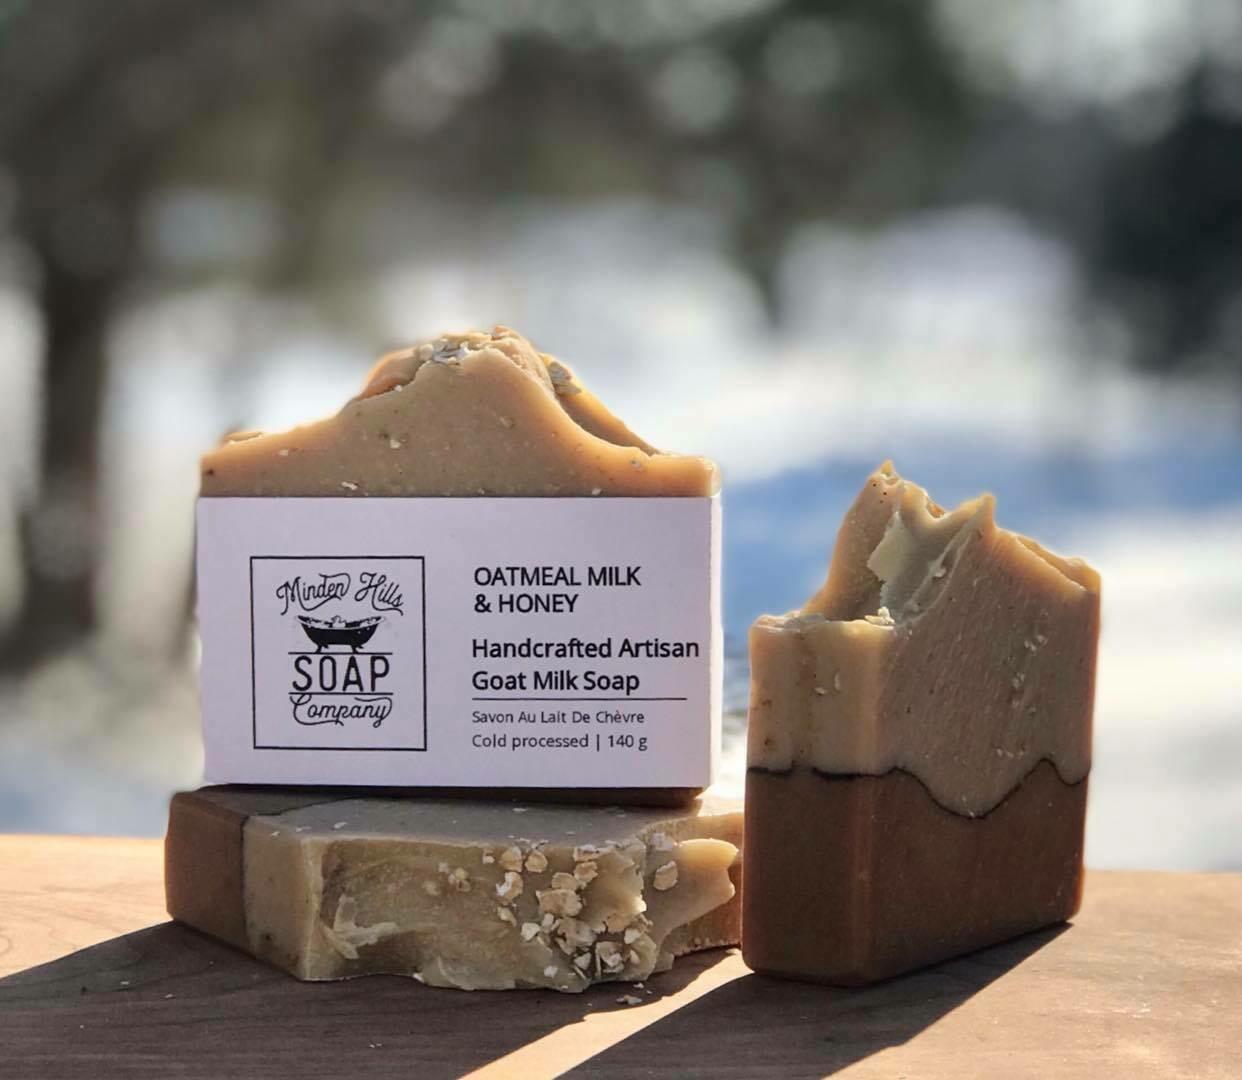 Oatmeal Milk & Honey - Goats Milk Soap